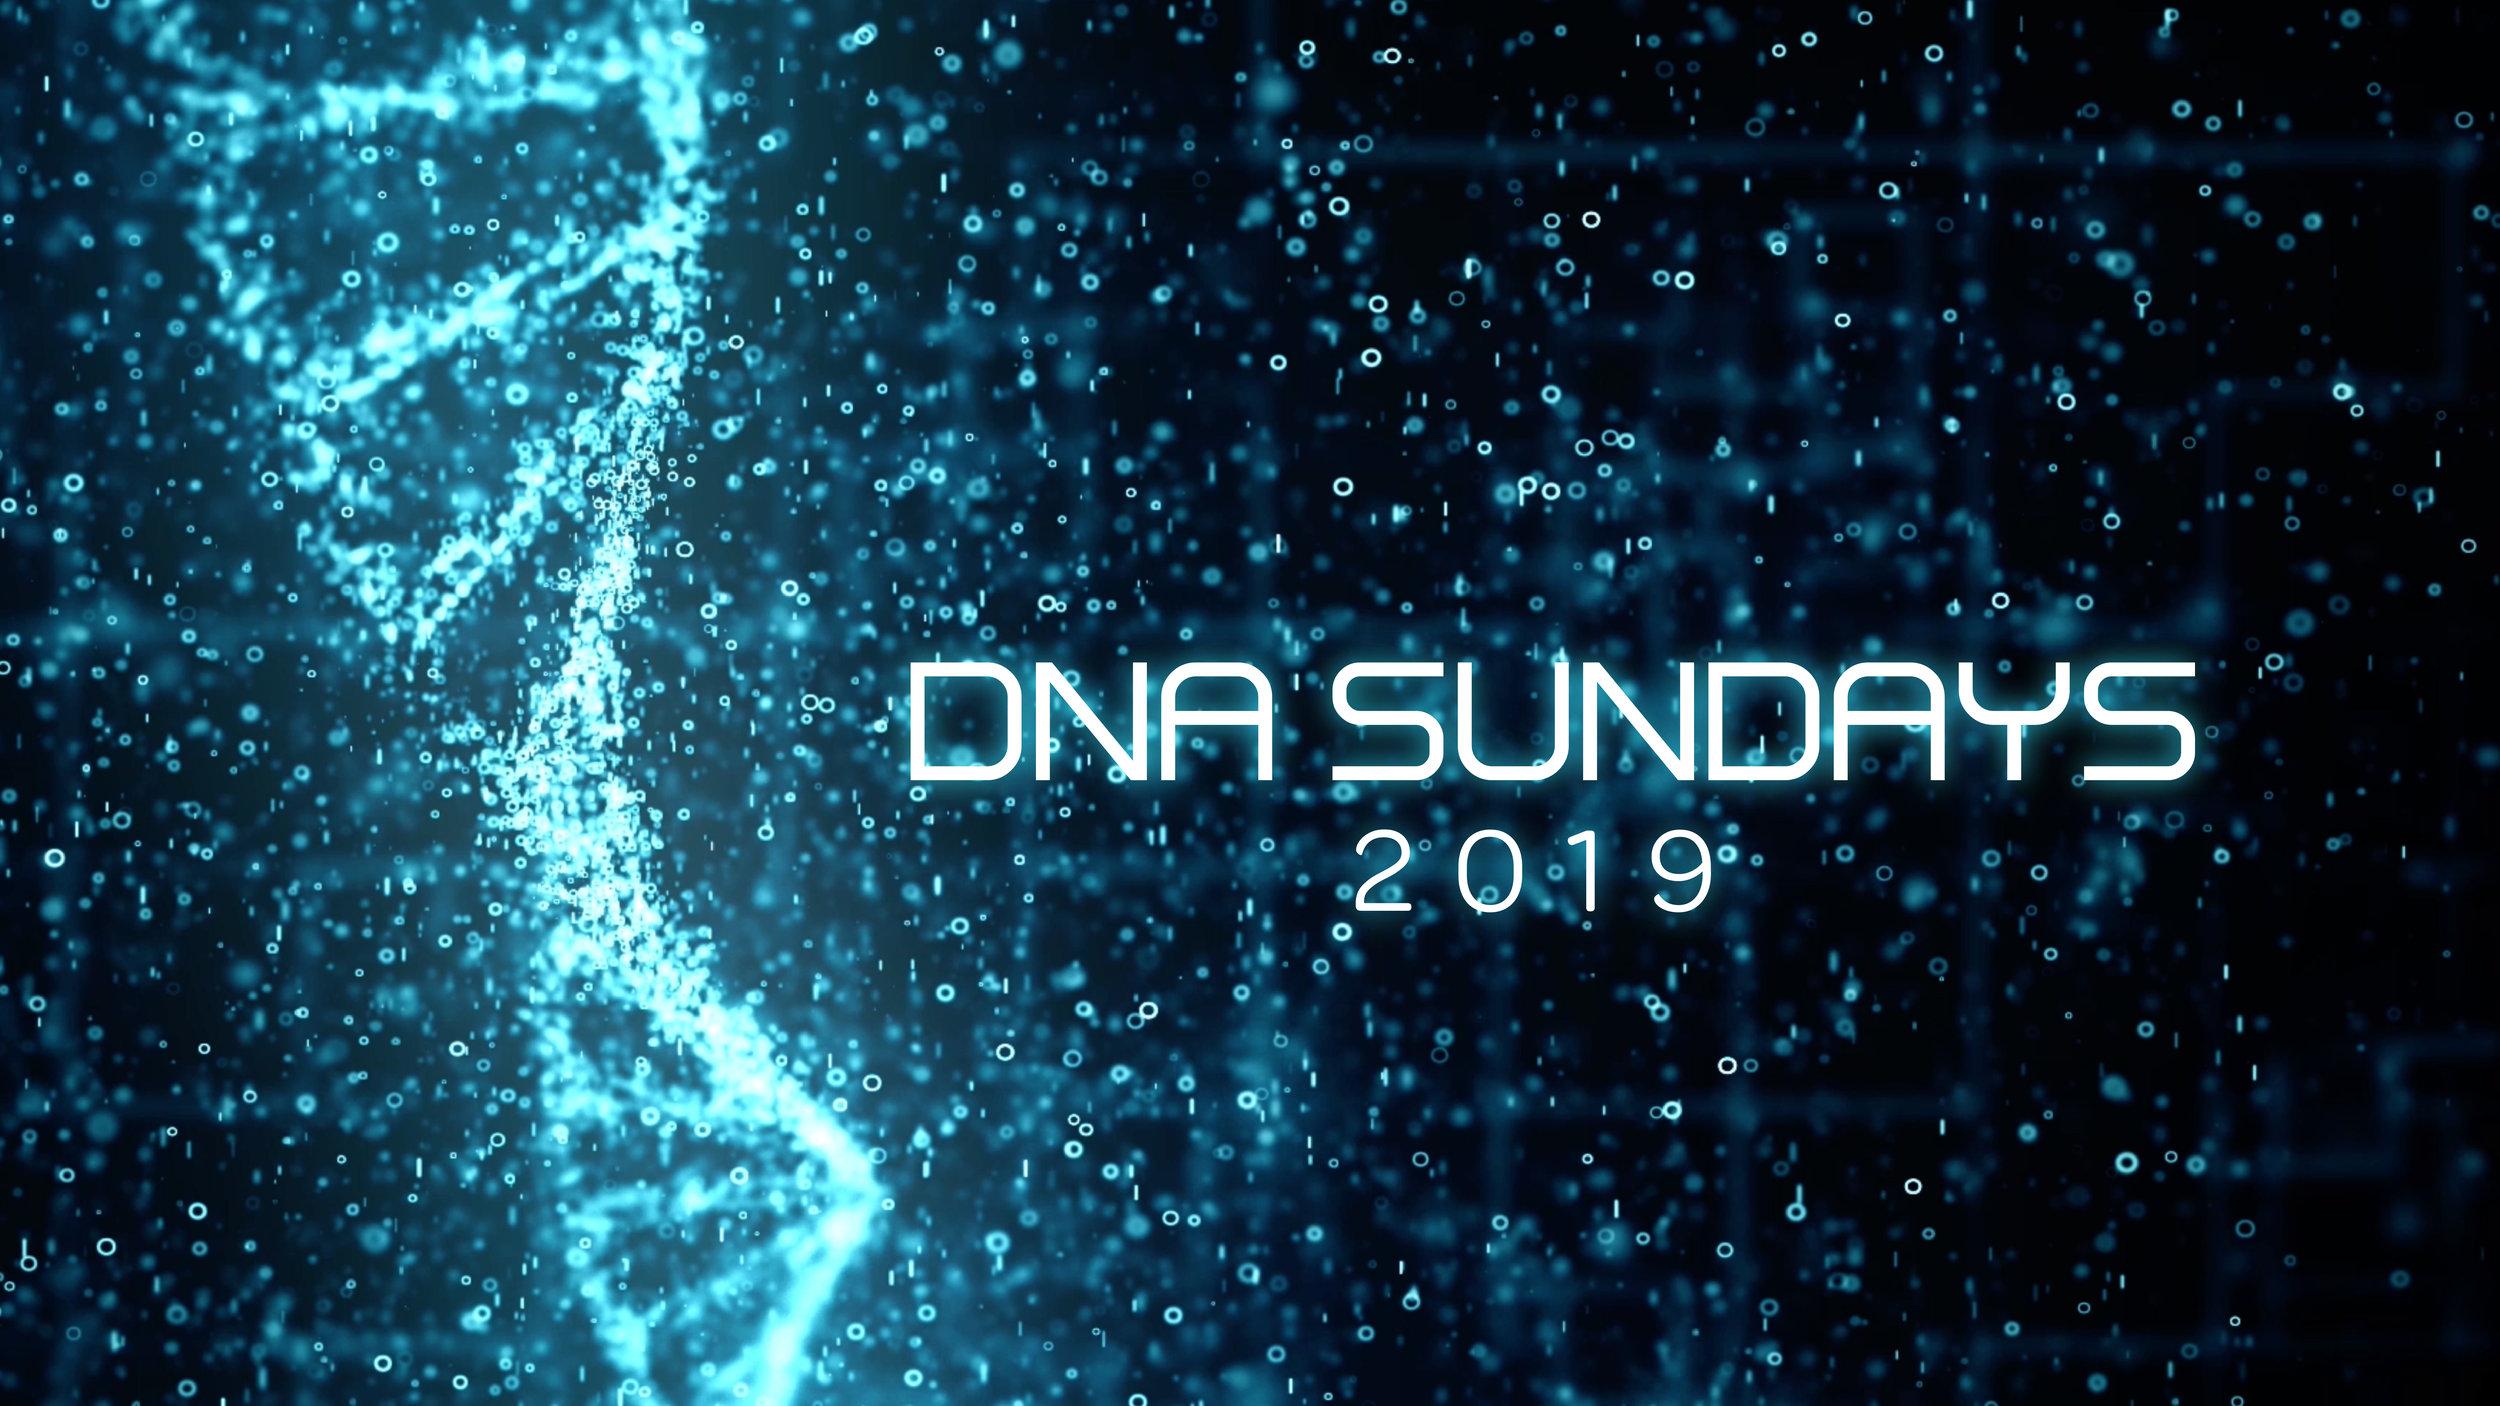 DNASunday-01.jpg